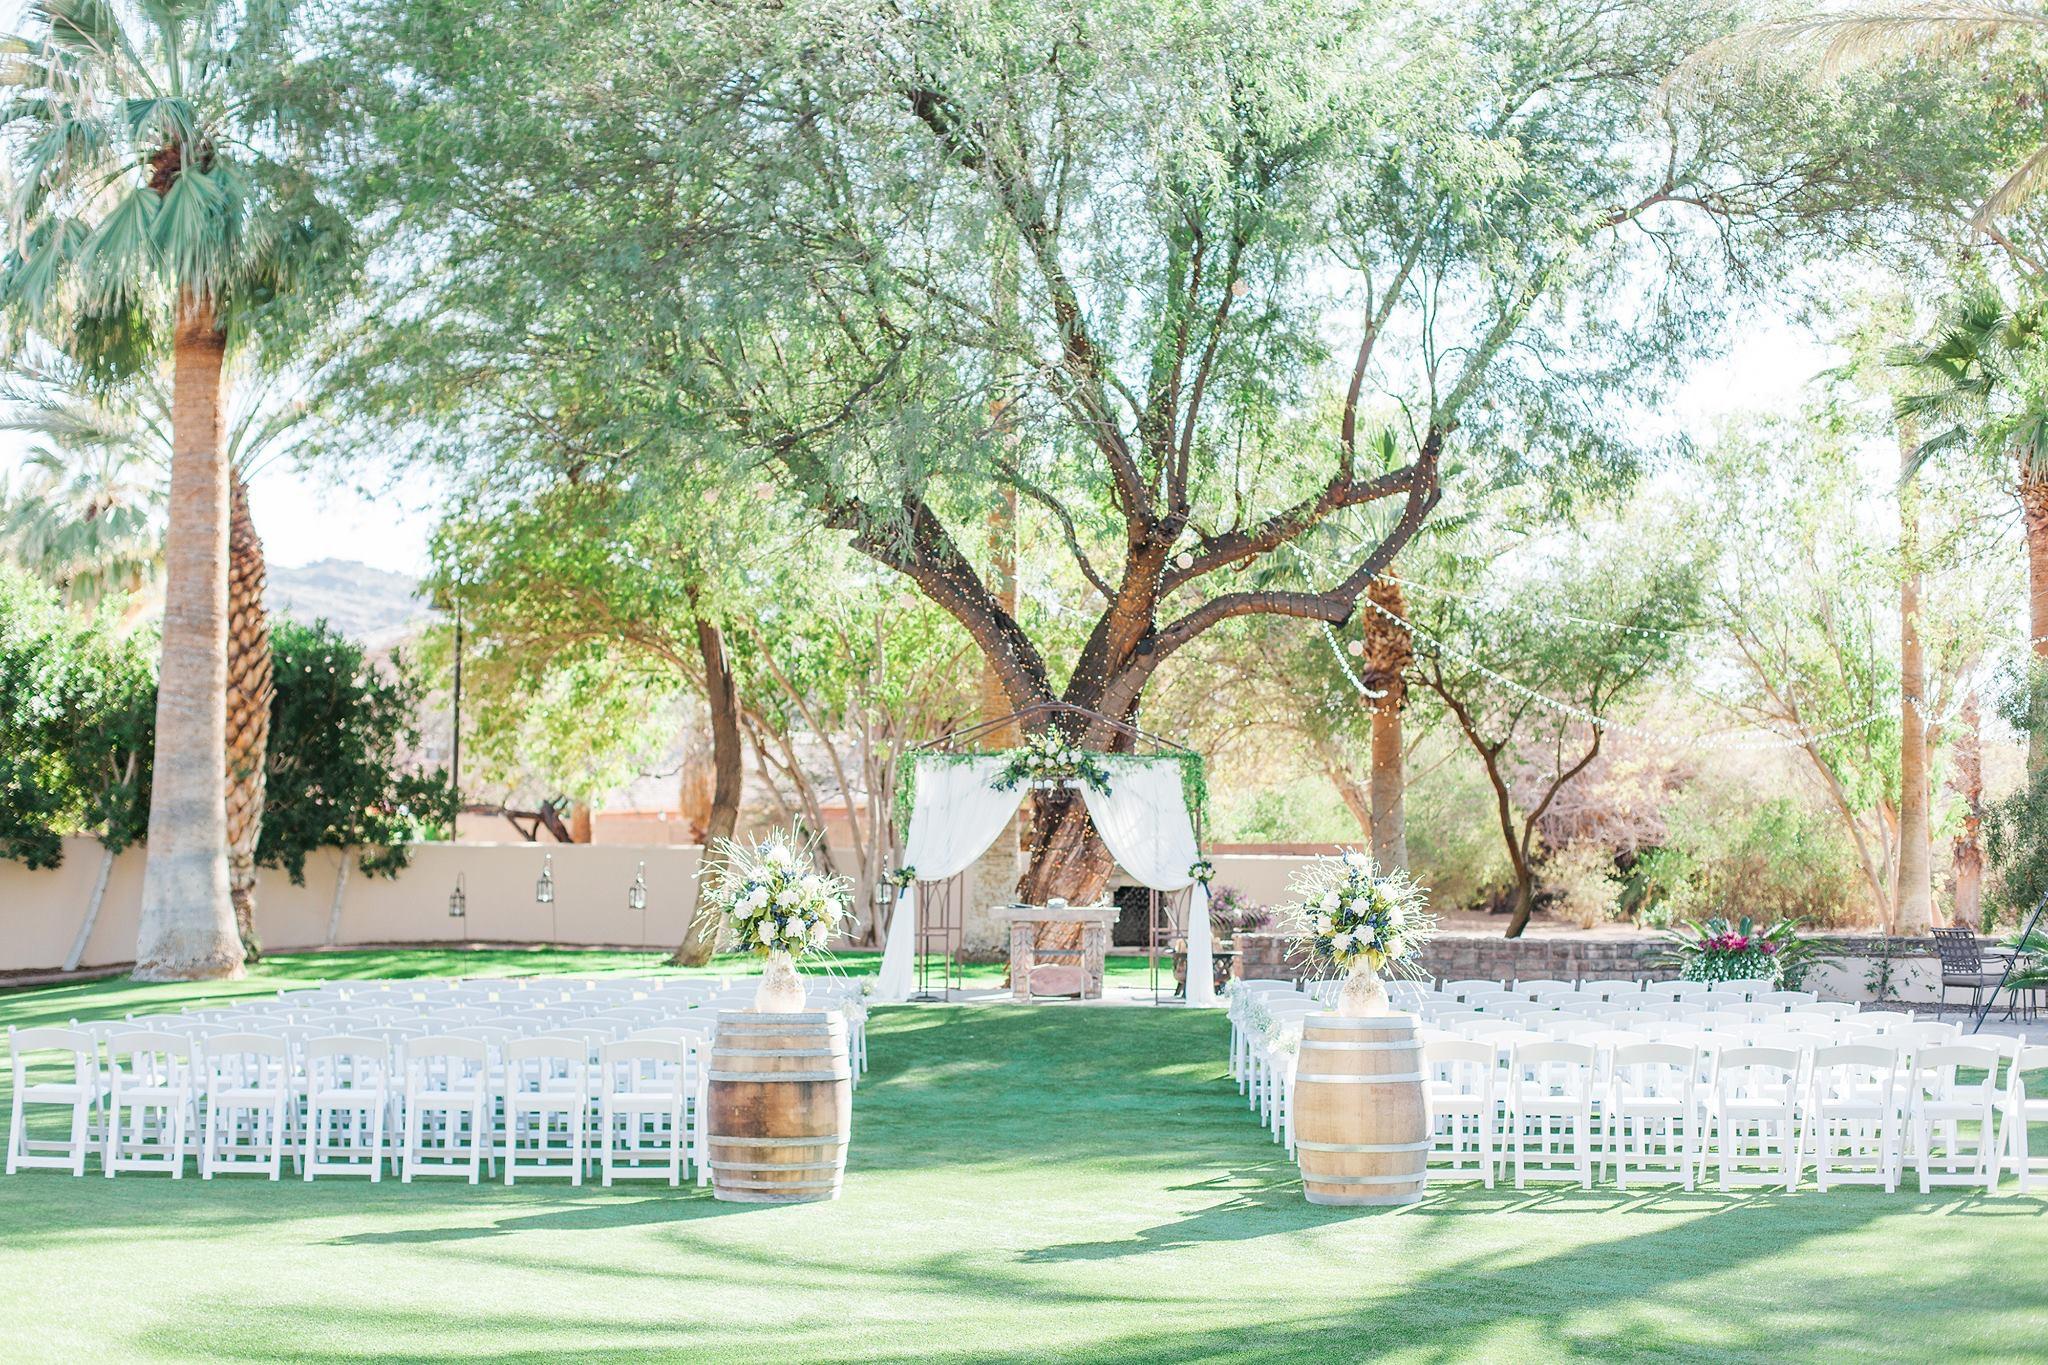 outdoor wedding ceremony set up at The Secret Garden Event Center